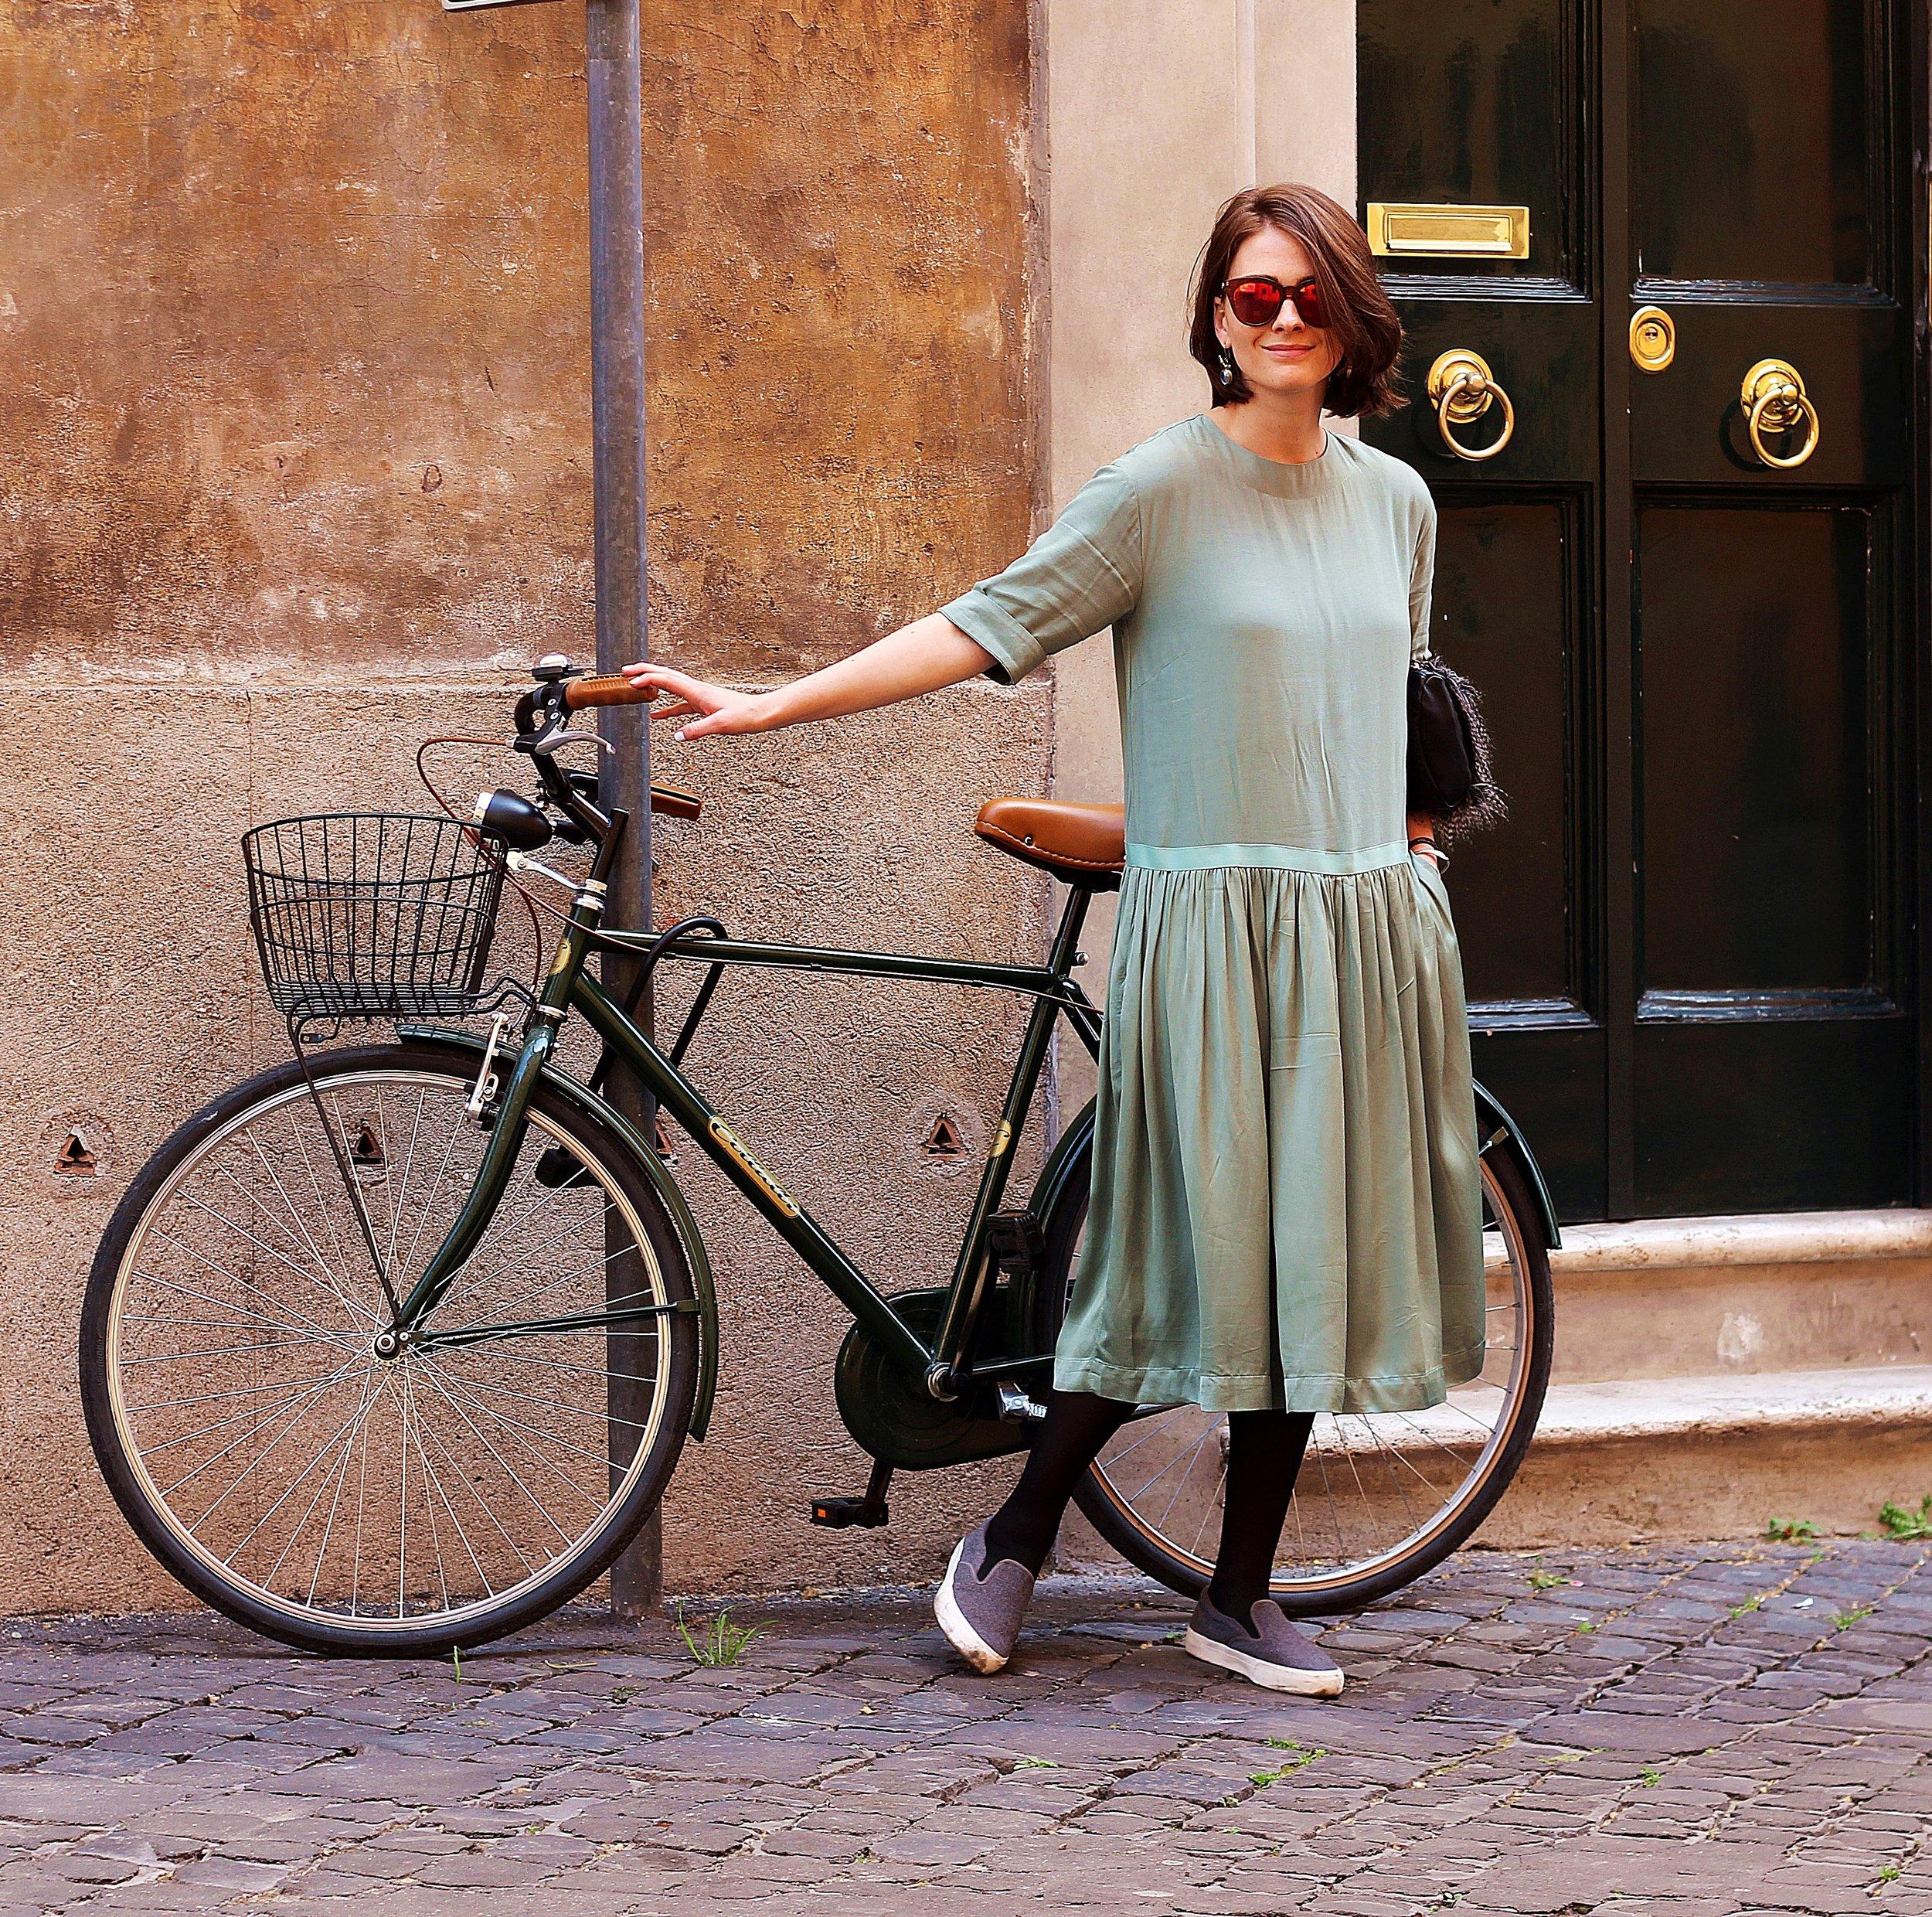 ann-a-porter-fashion-blog-roma-italy-blogger-annaporter(8)_edited